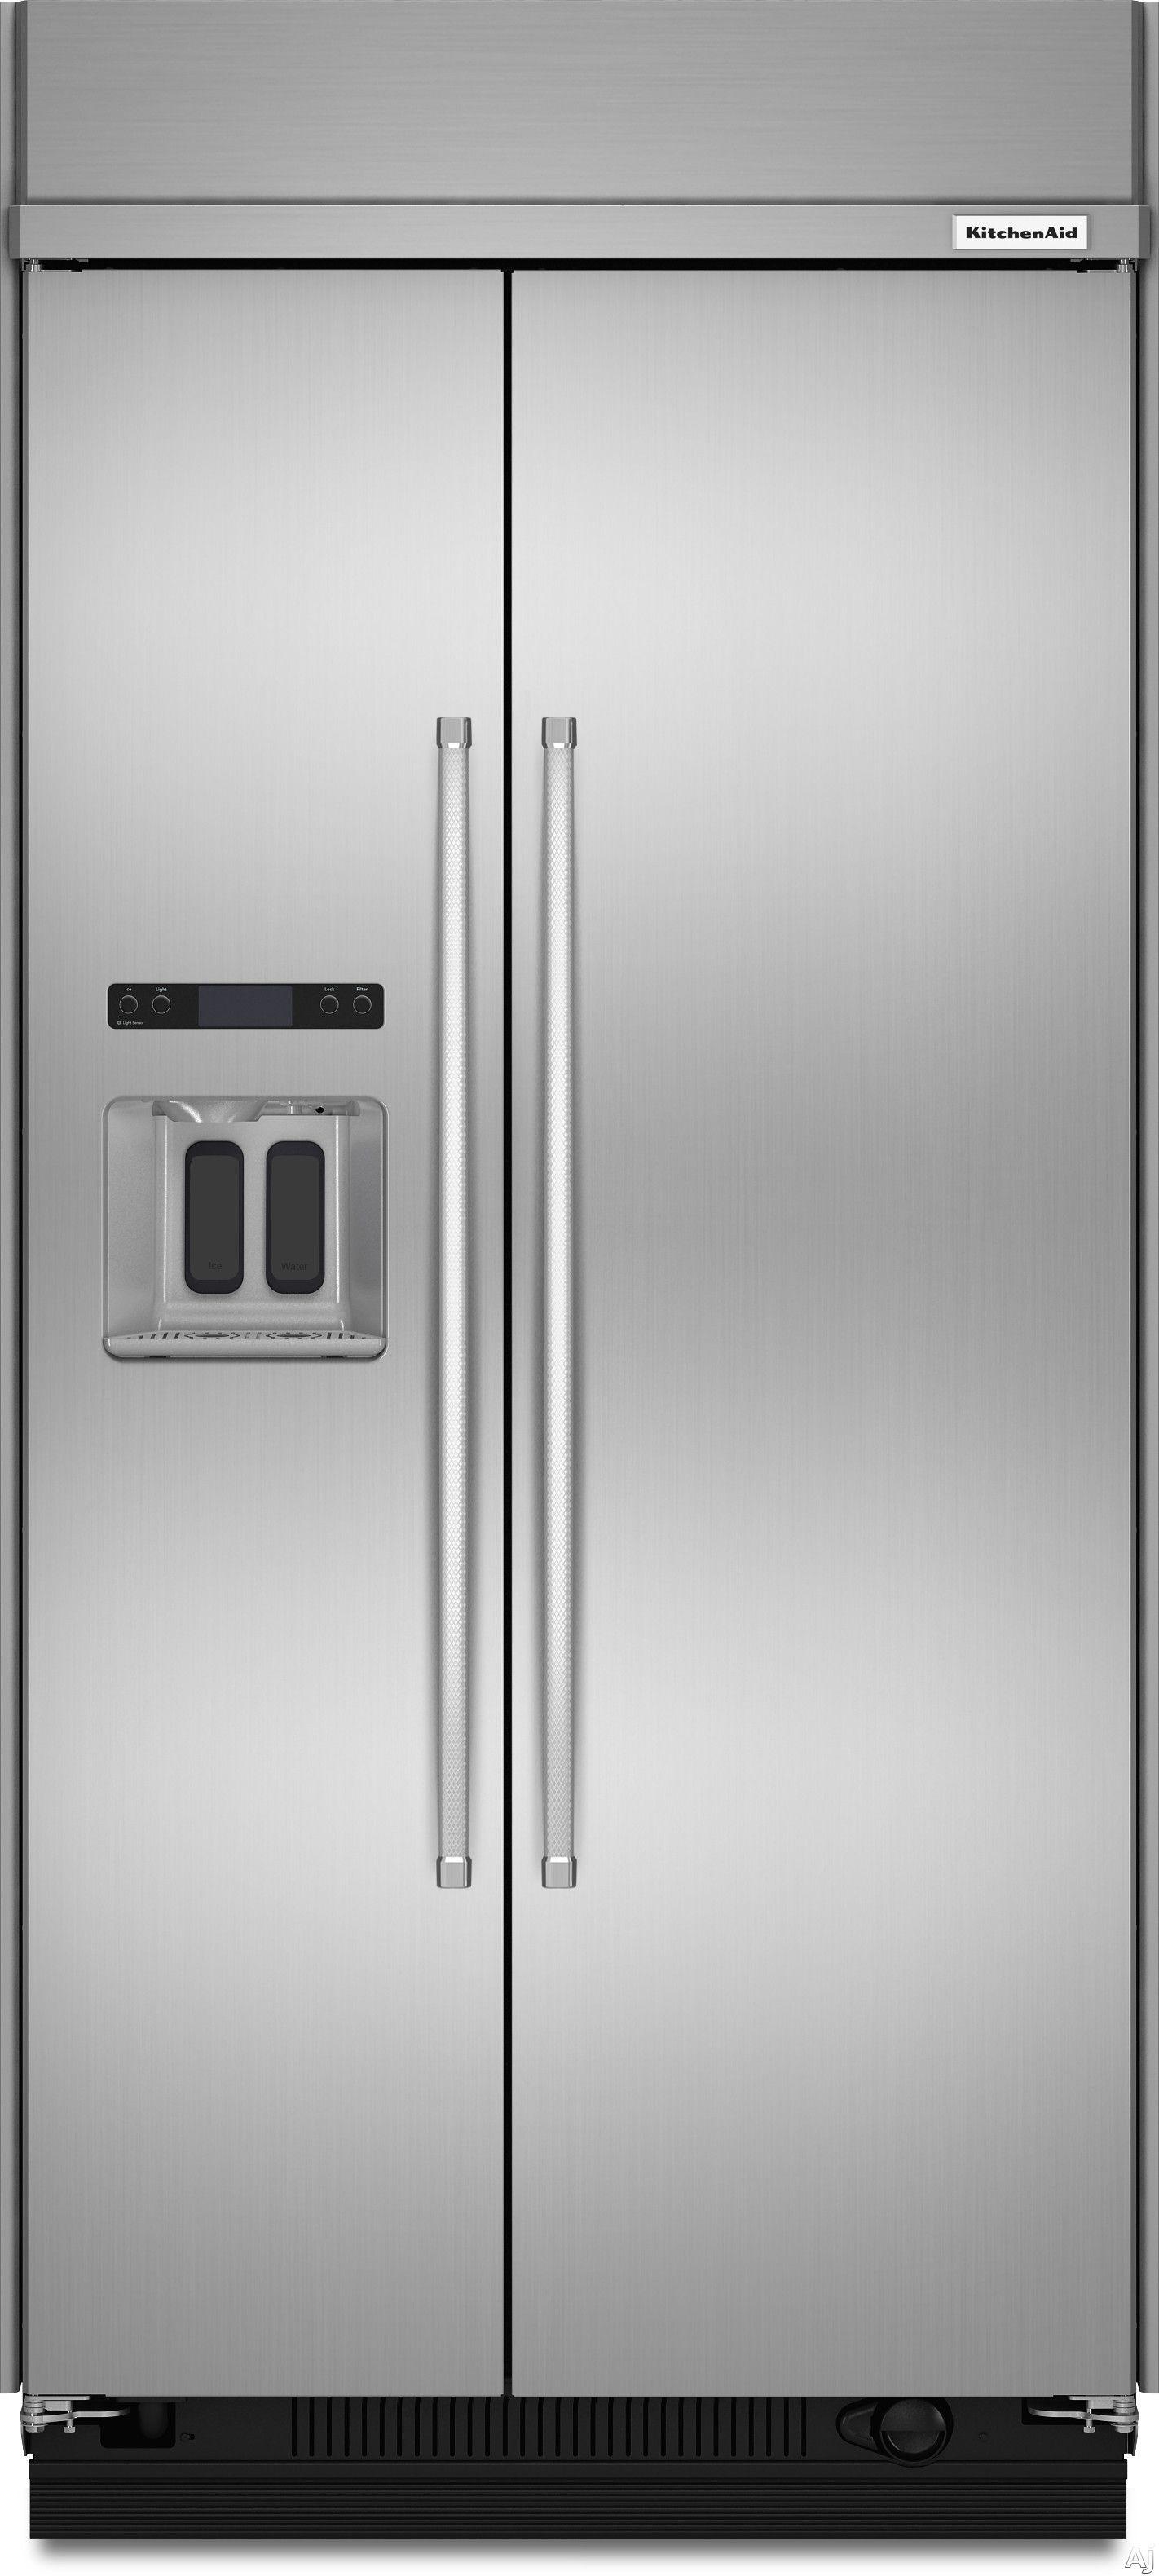 Jennair 42 inch builtin side by side refrigerator built